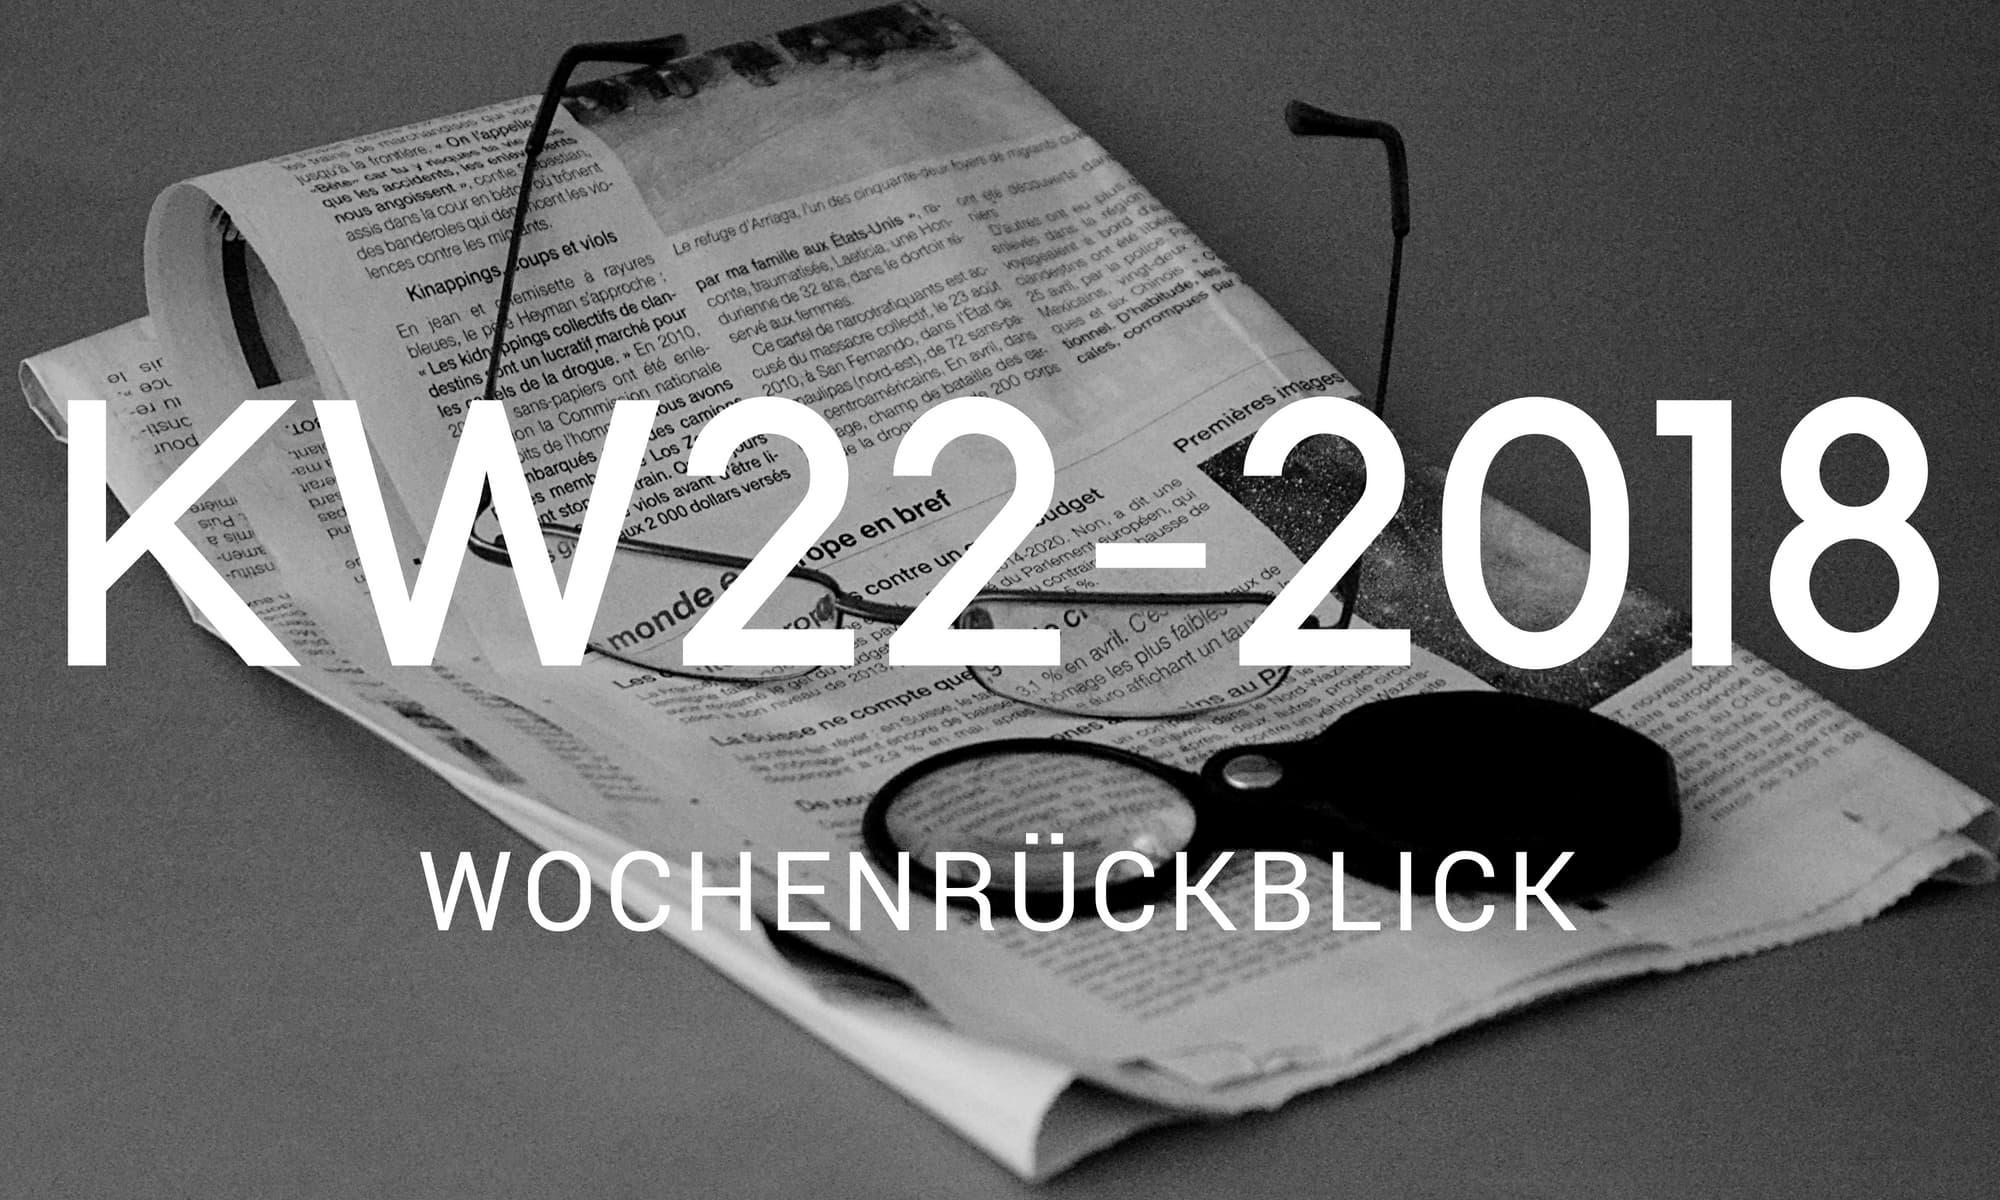 wochenrueckblick camping news KW22 2018